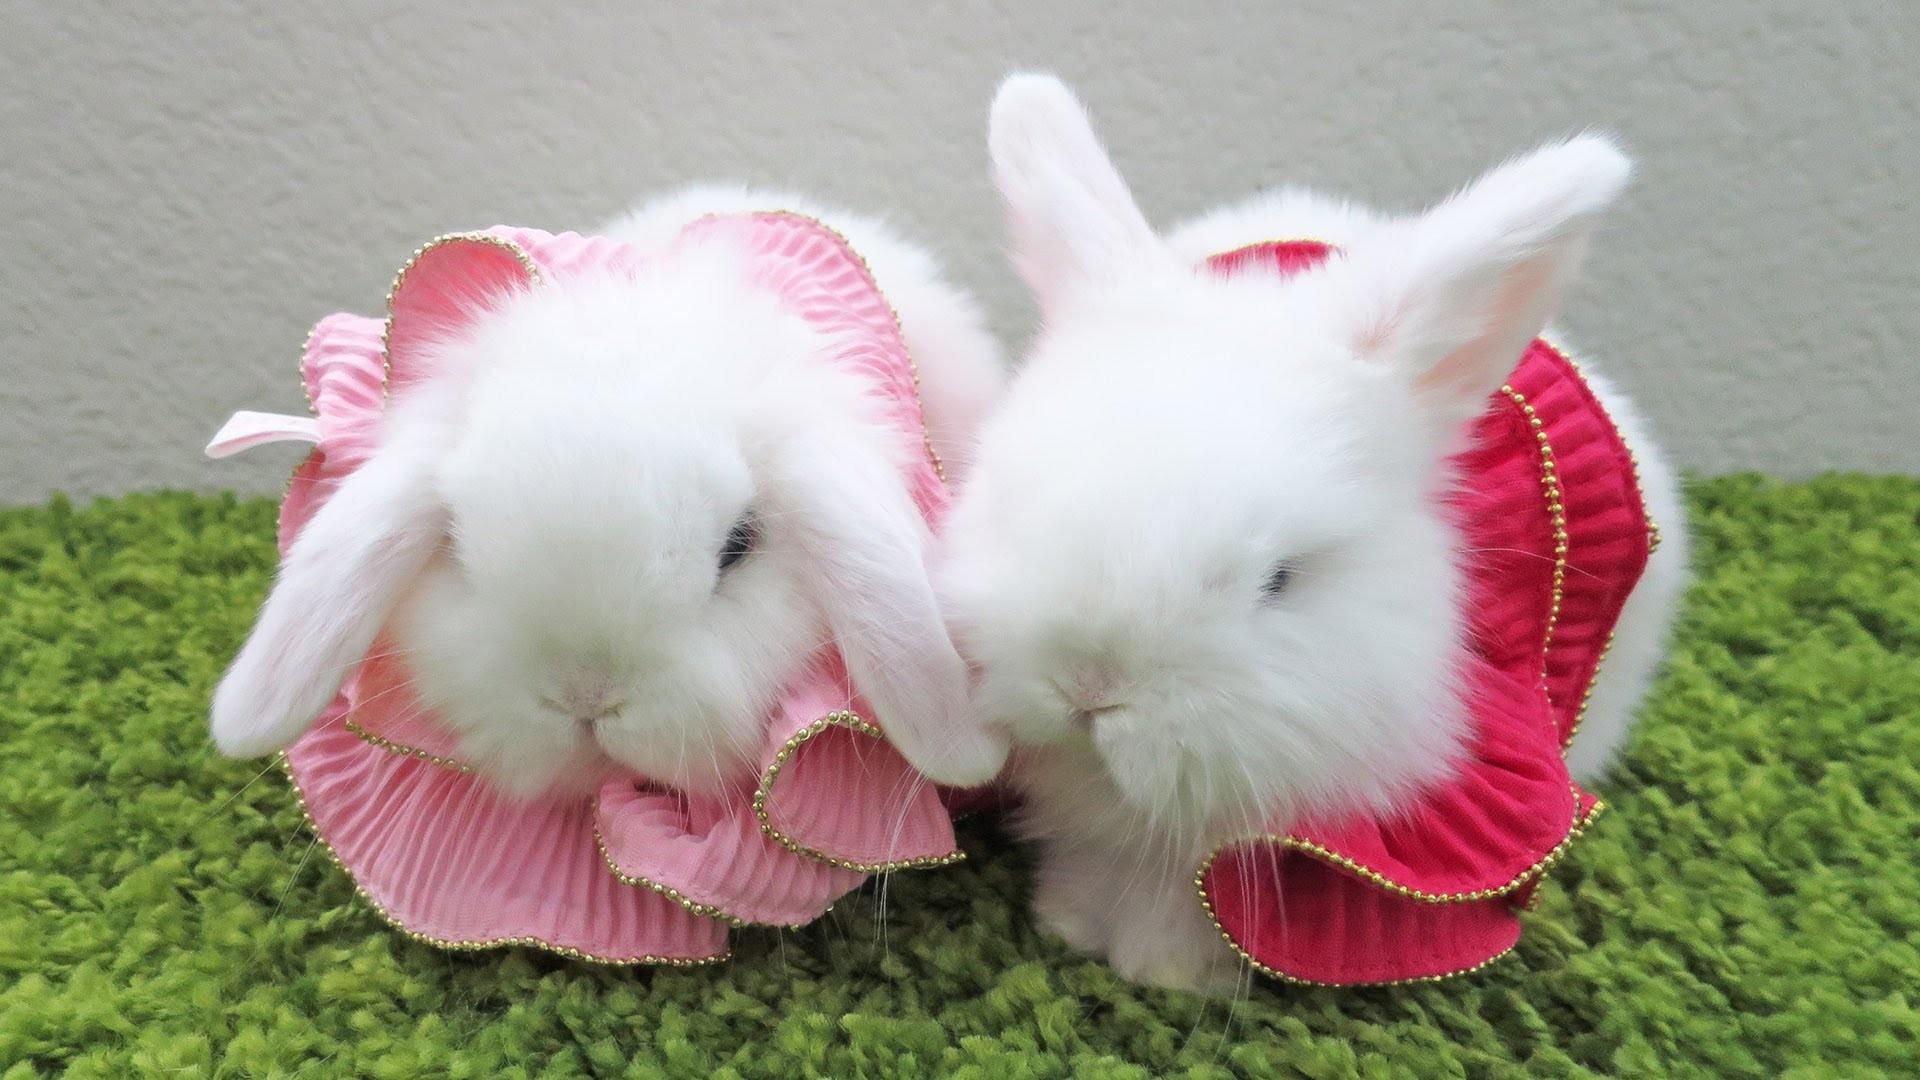 Baby Bunny Wallpaper ·①